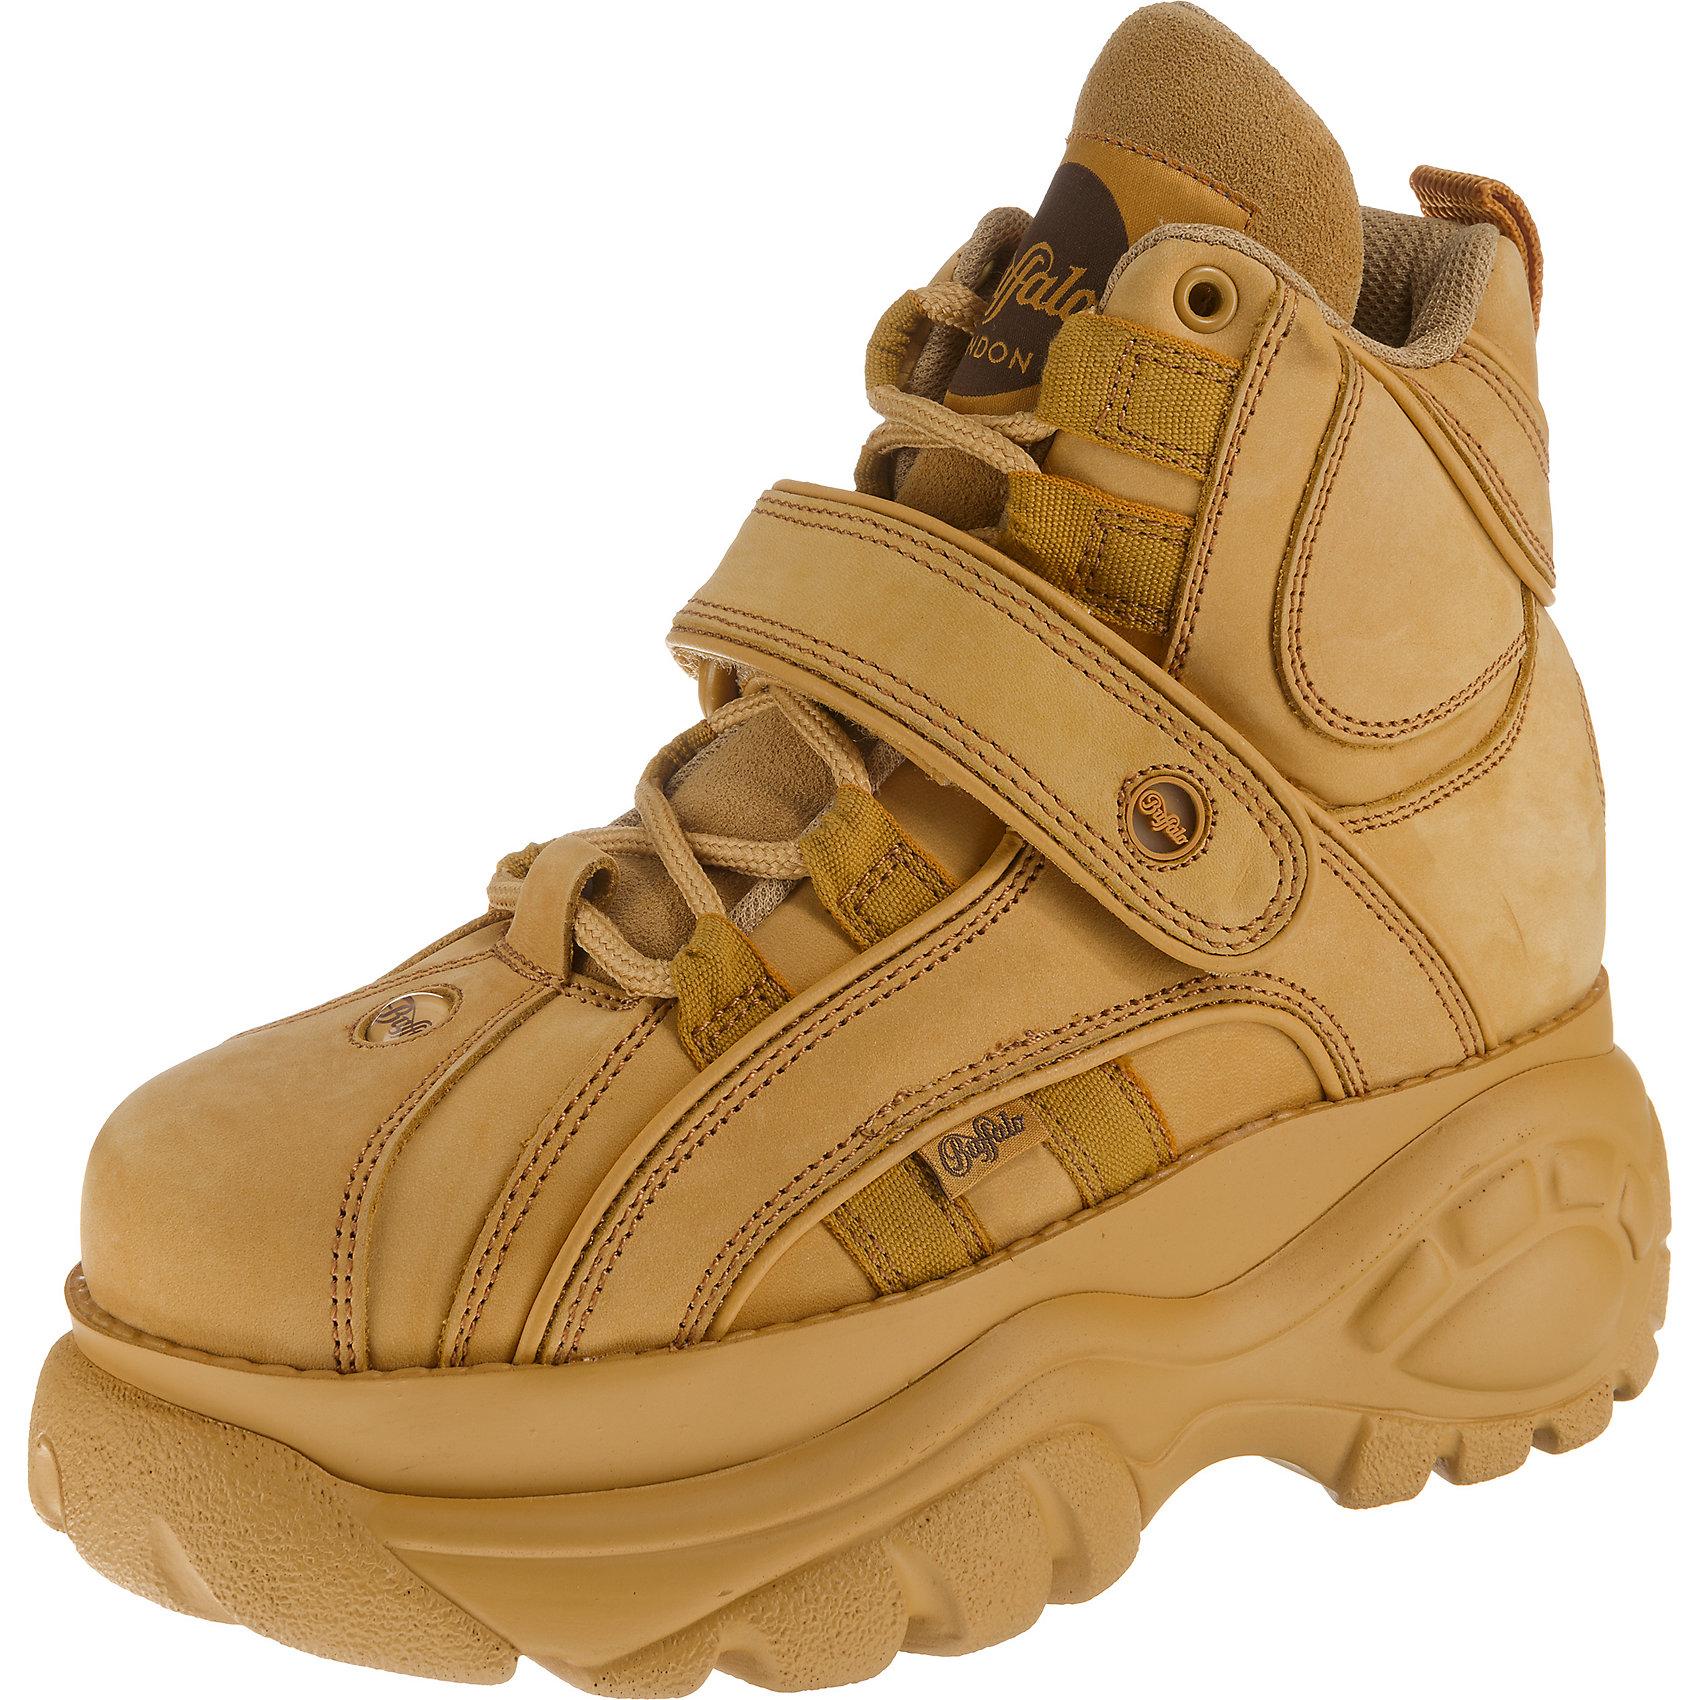 Neu Buffalo London Plateau Classics Sneakers High 8714811 für Damen